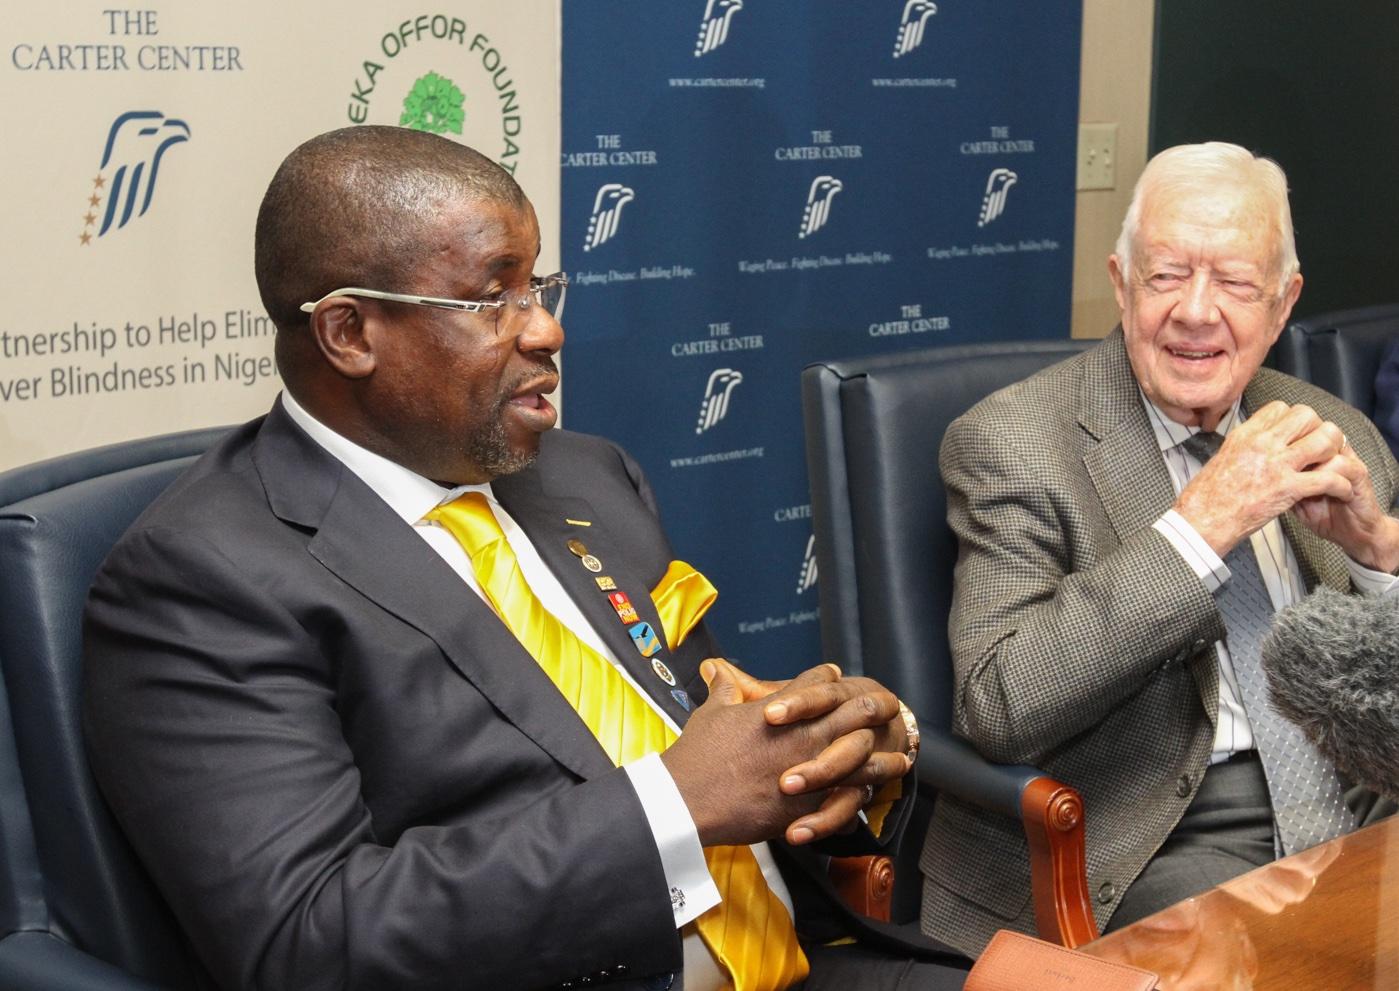 Sir Emeka Offer and President Jimmy Carter